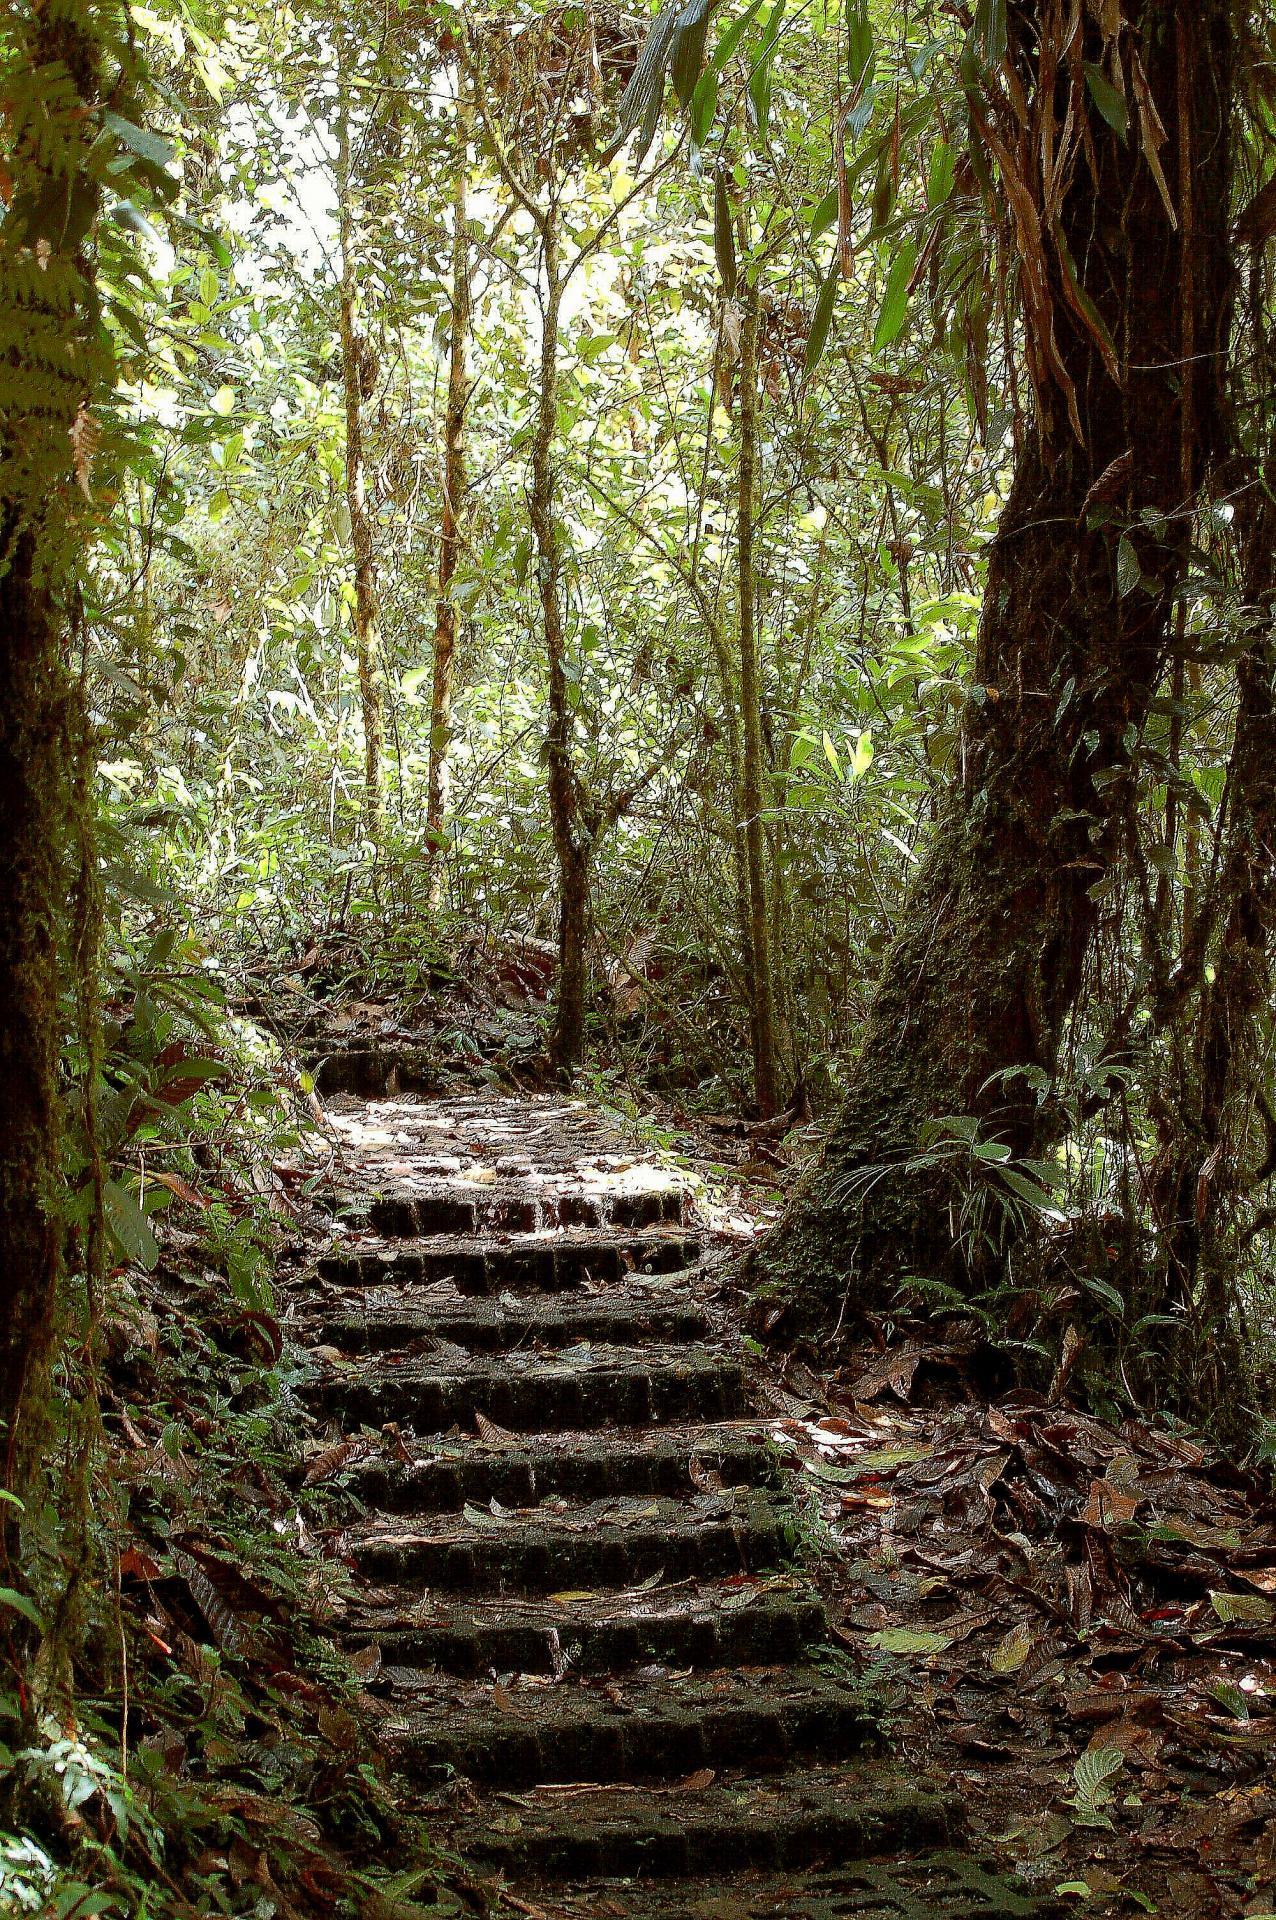 Entree jungle avec escalier